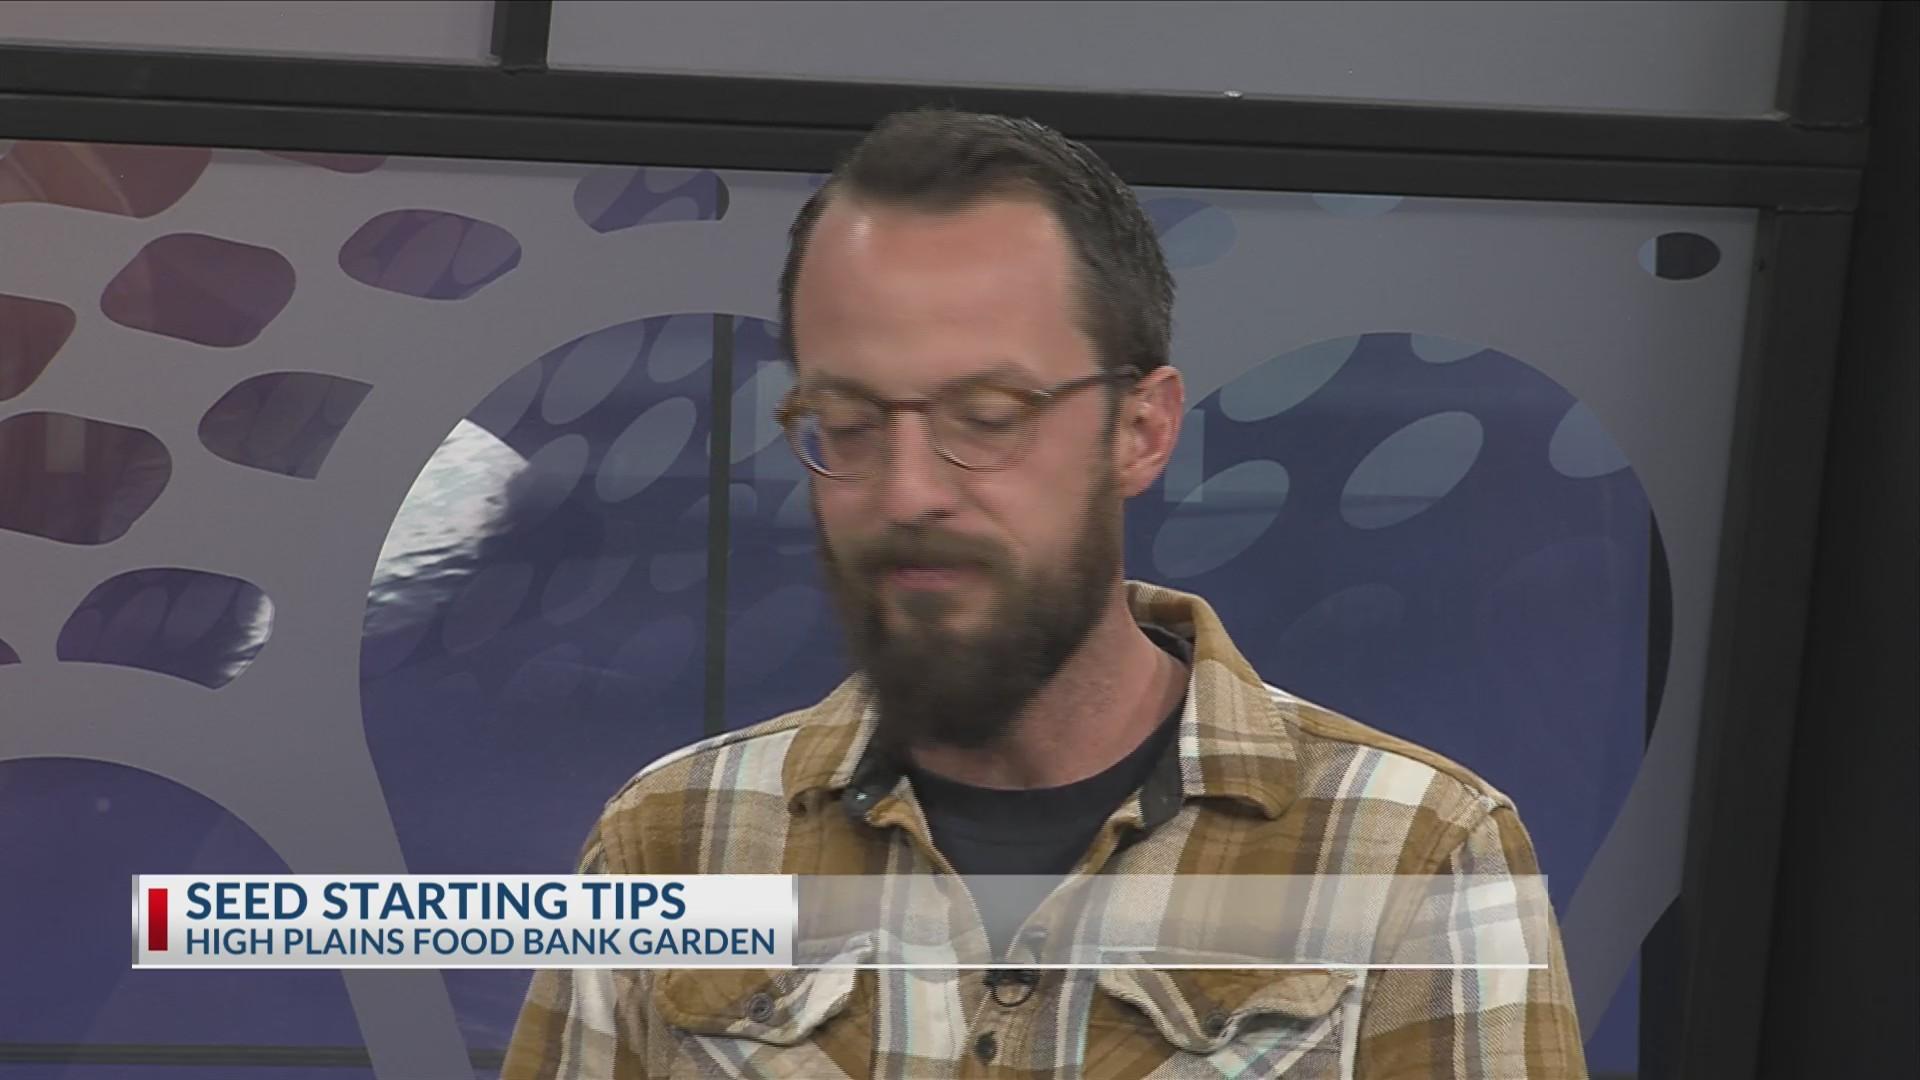 High Plains Food Bank Garden - Seed Starting Tips